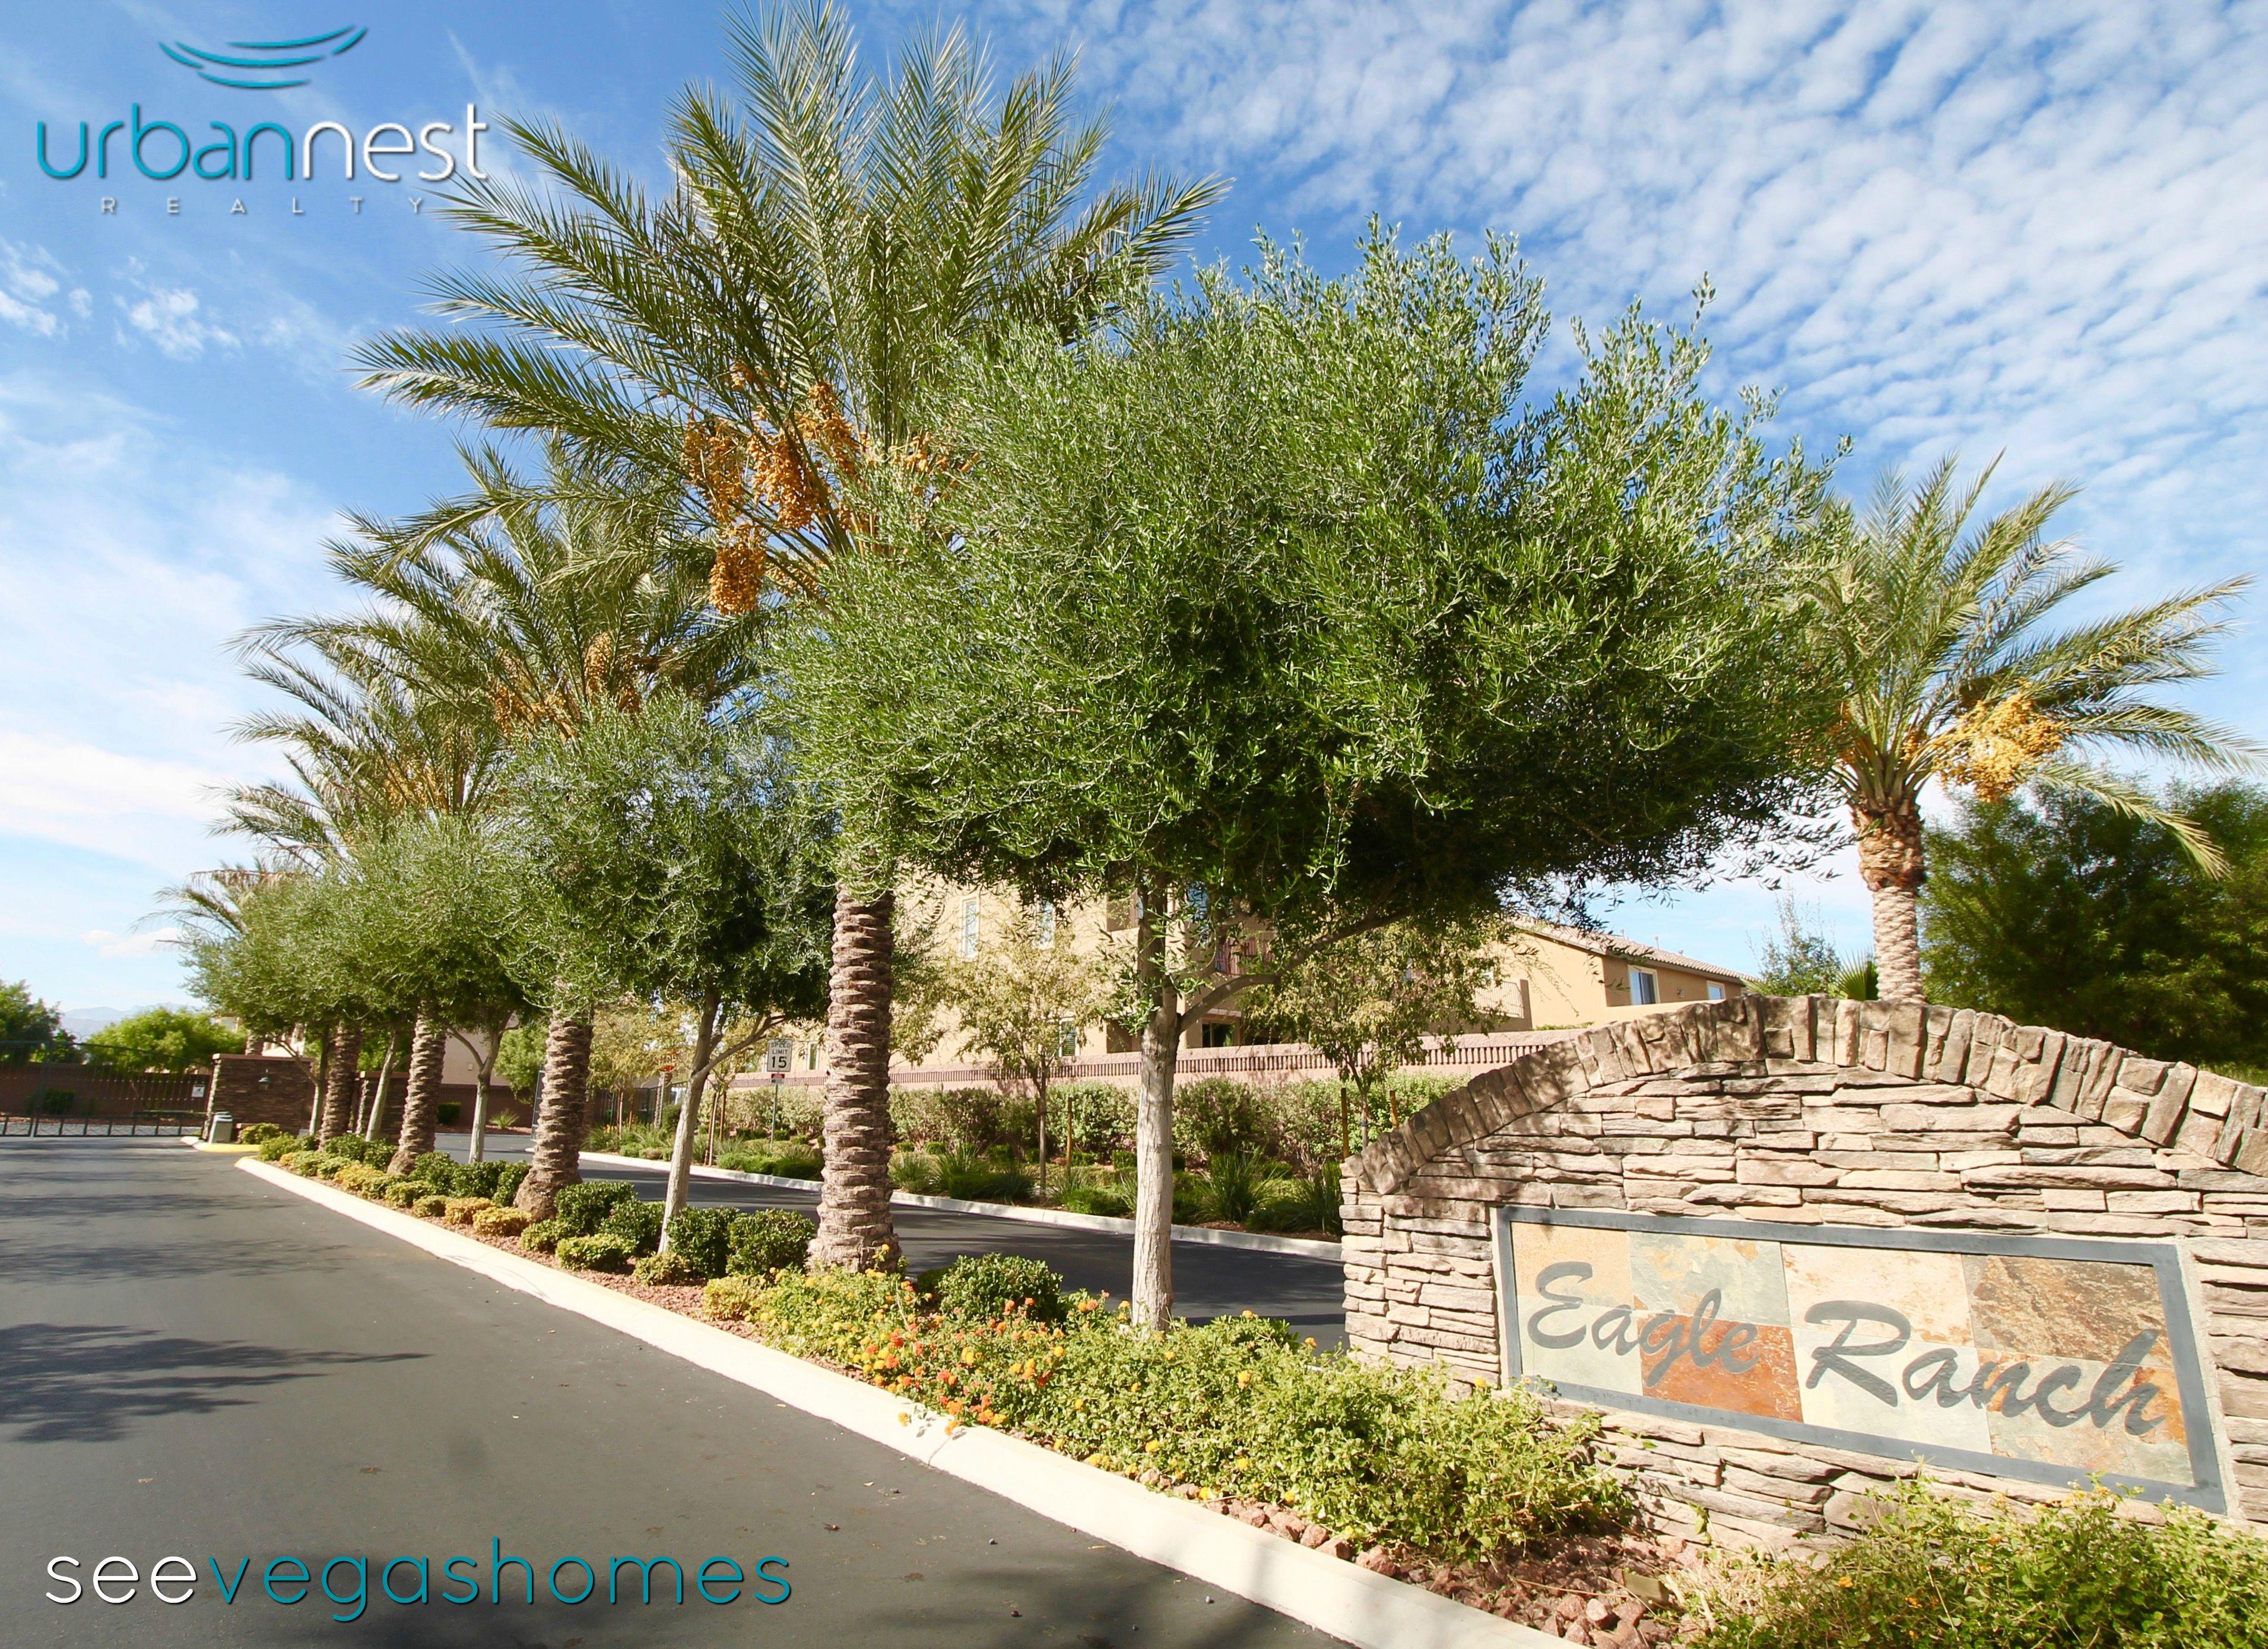 Eagle ranch las vegas nv 89131 seevegashomes ranch homes